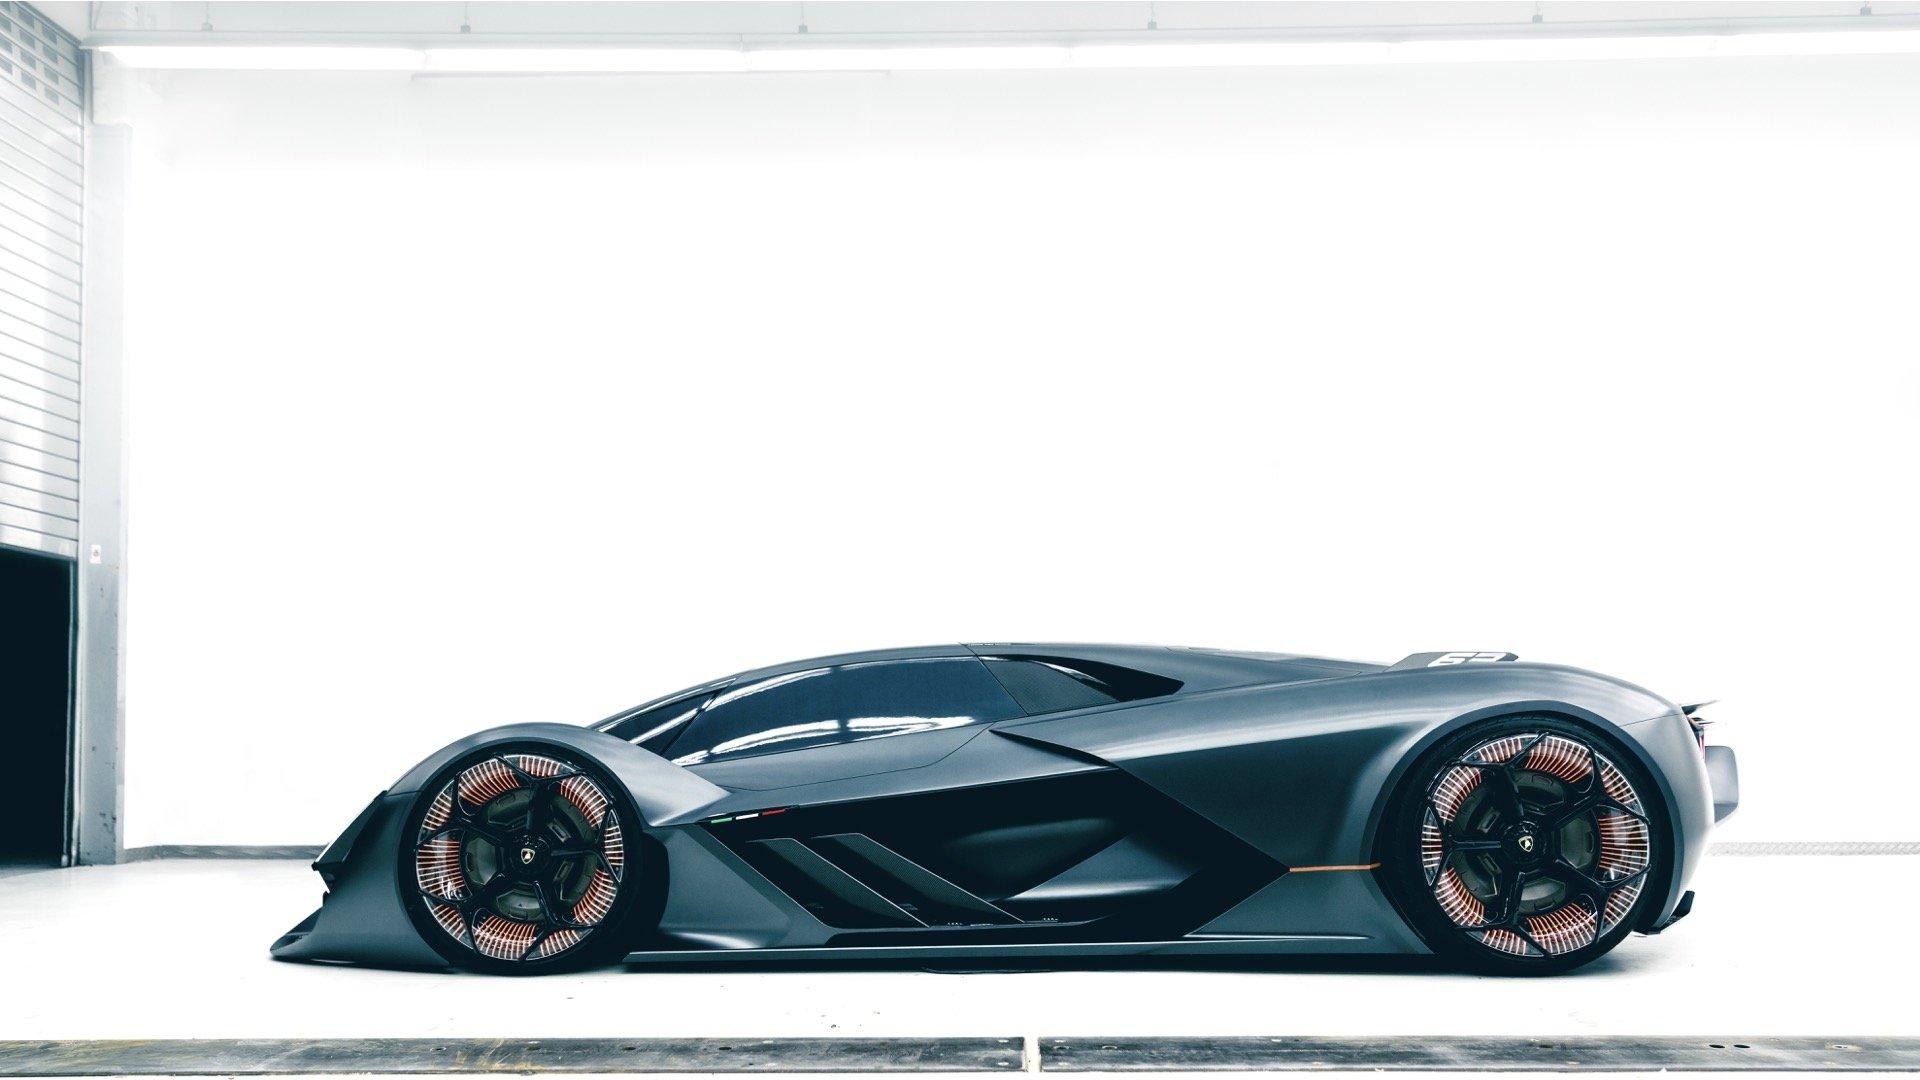 5 Lamborghini Terzo Millennio Hd Wallpapers Background Images